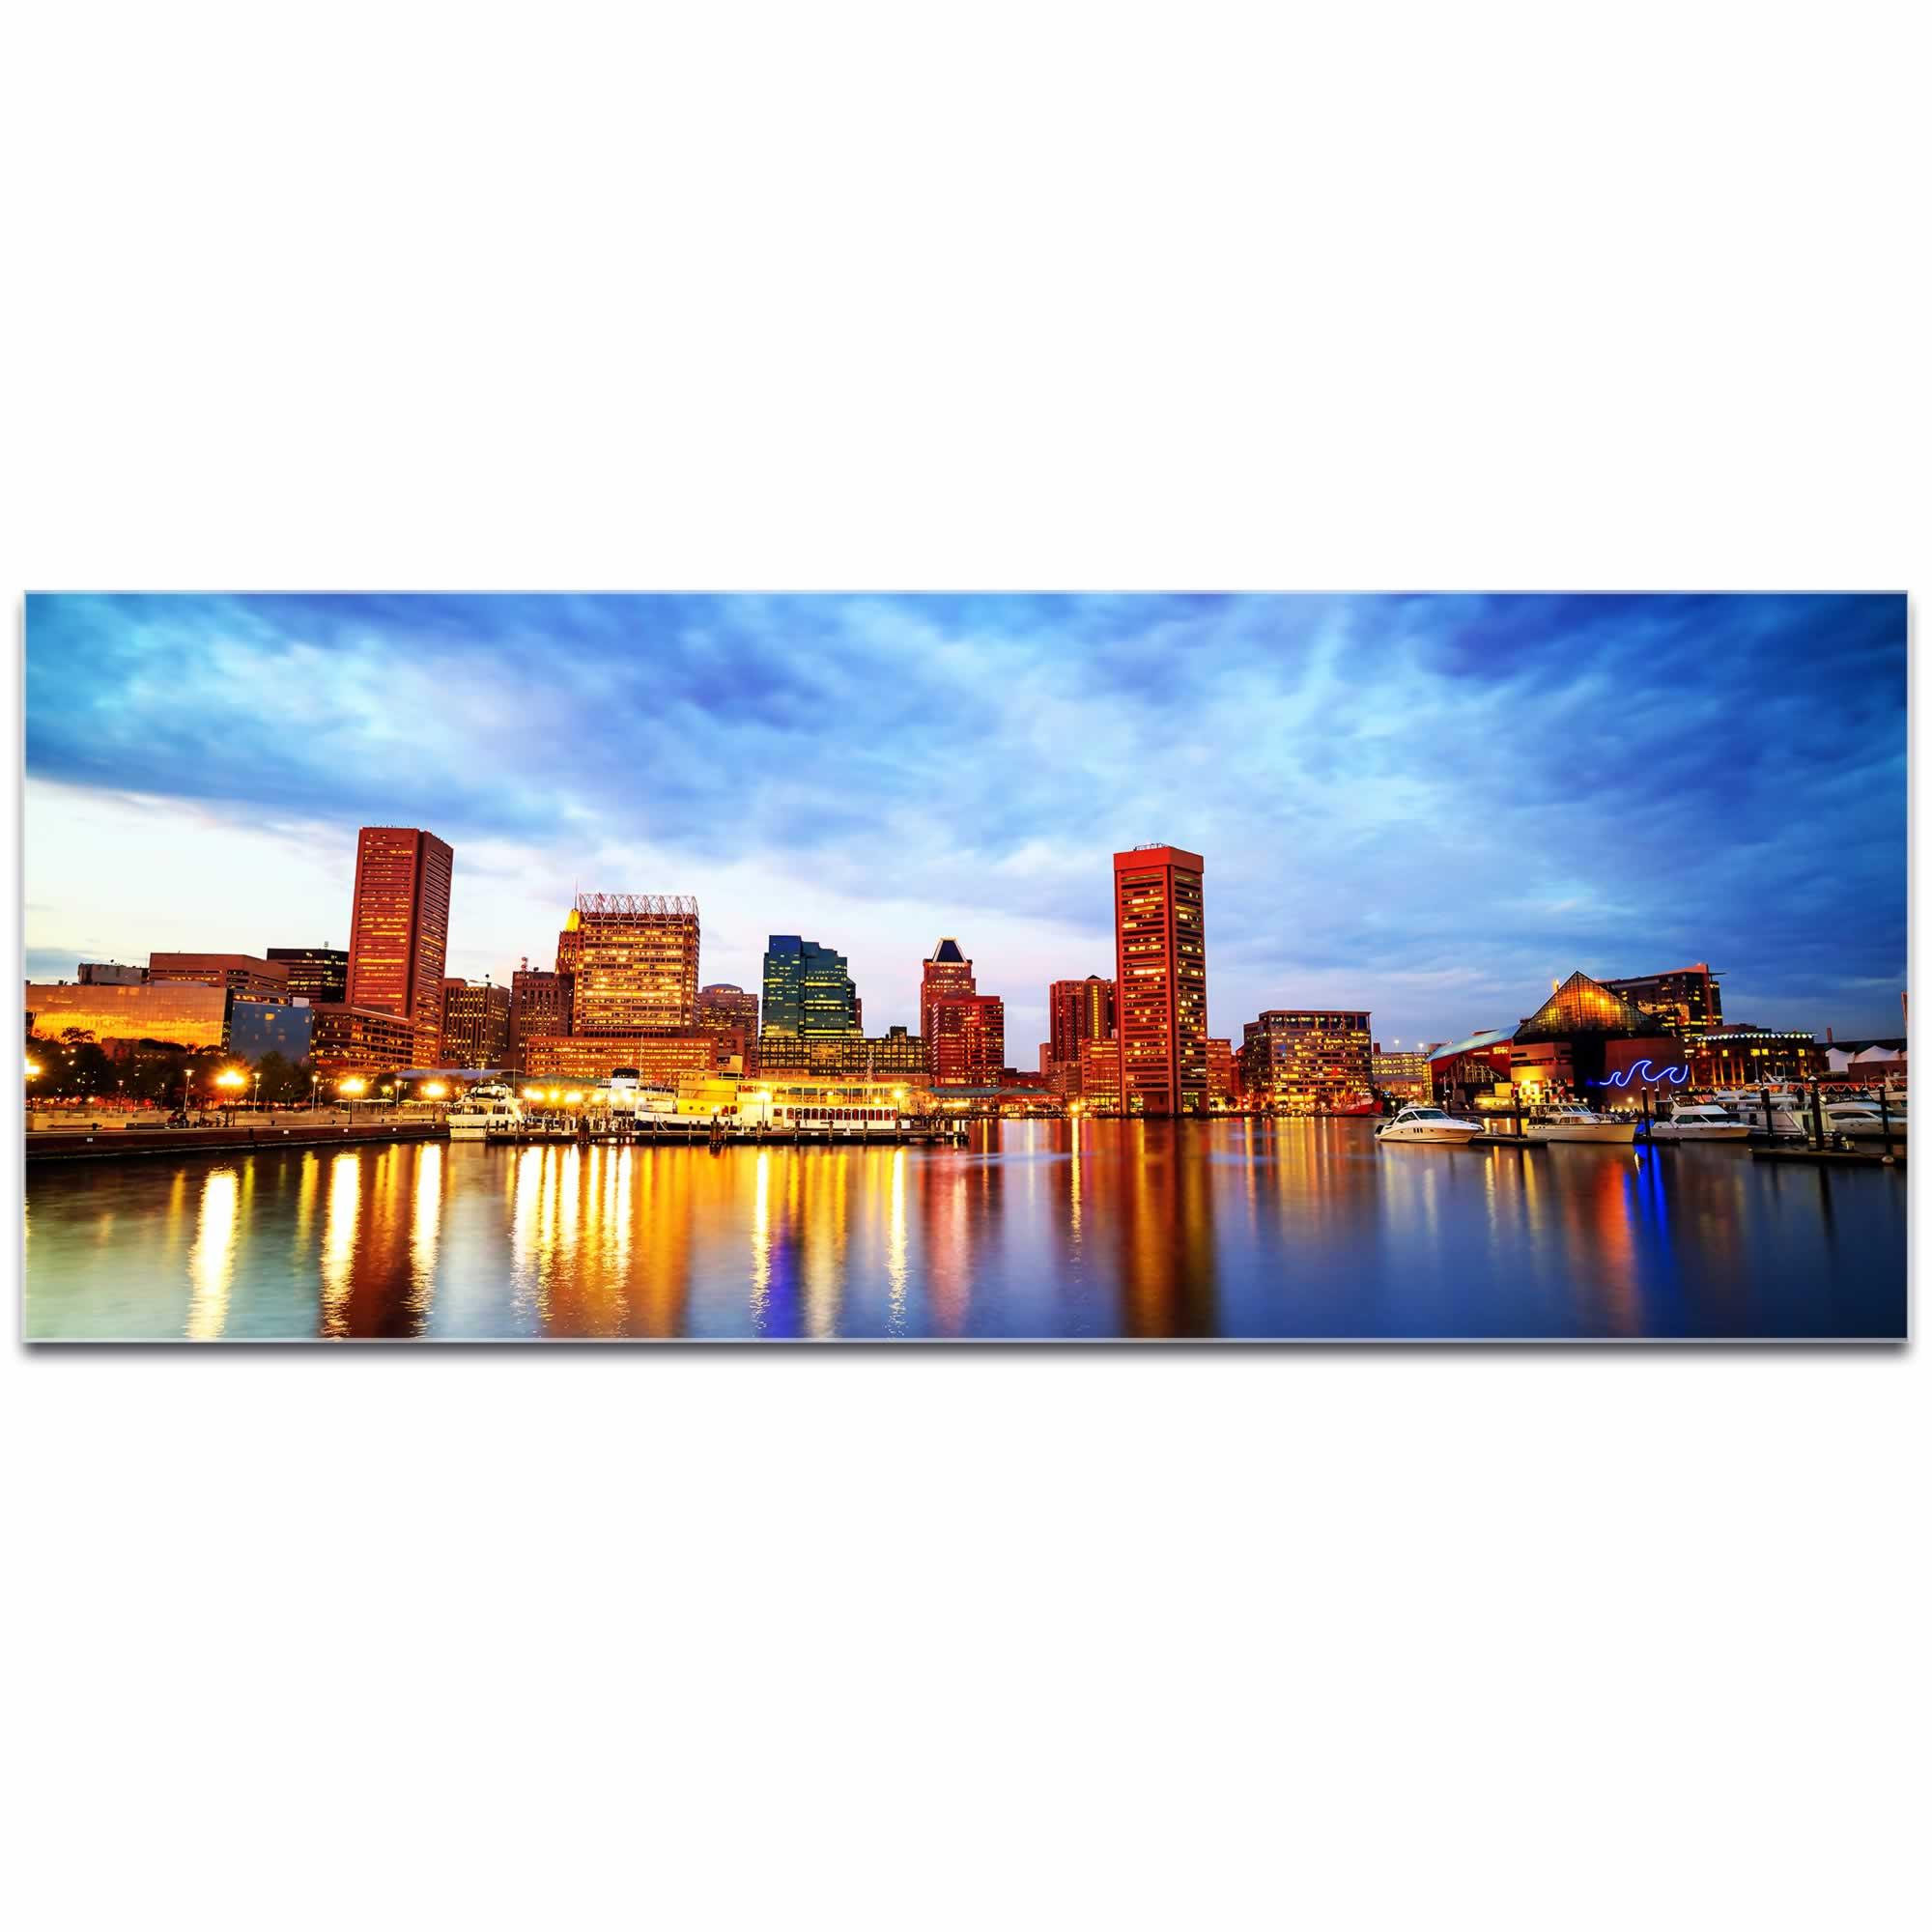 Baltimore City Skyline - Urban Modern Art, Designer Home Decor, Cityscape Wall Artwork, Trendy Contemporary Art